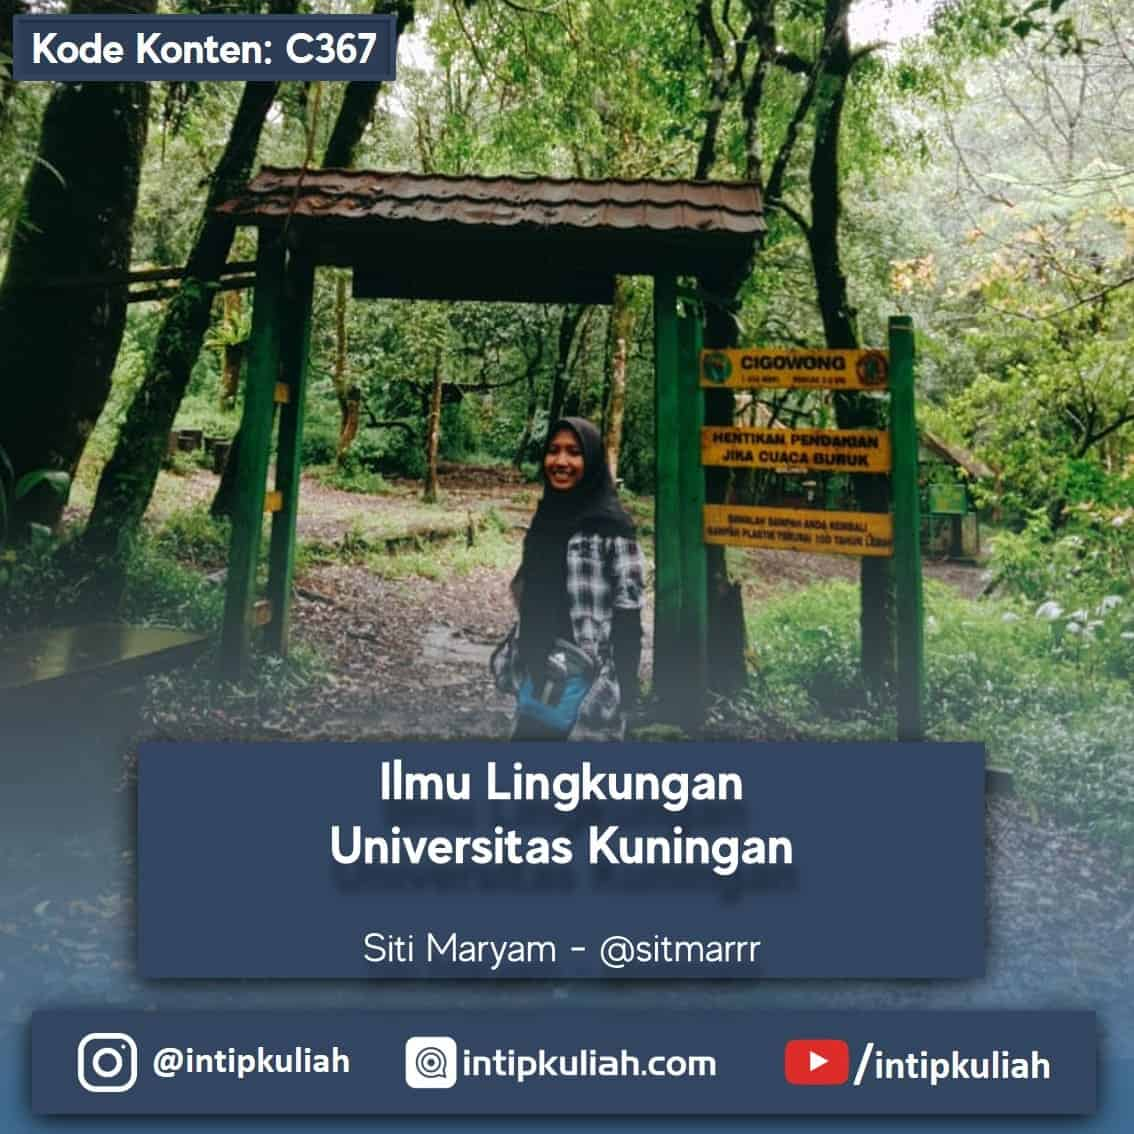 Ilmu Lingkungan Universitas kuningan (Maryam)